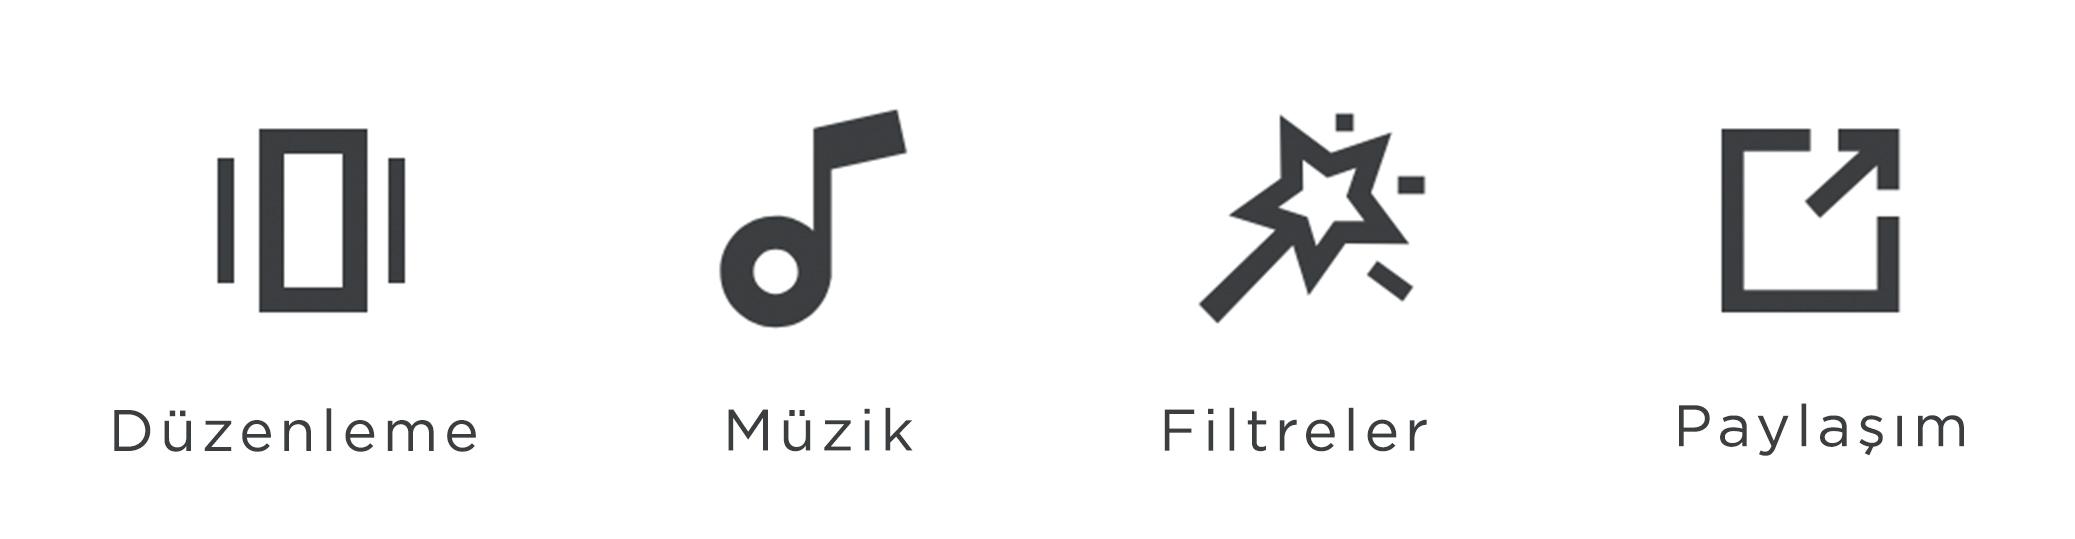 https://www.karacasulu.com/wp-content/uploads/2020/03/icons.jpg